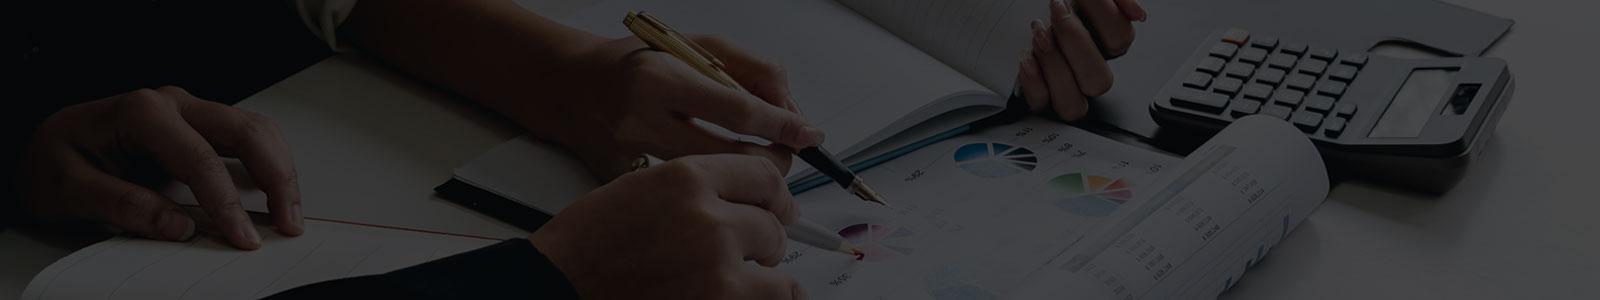 Outsourcing Financial Controller Services